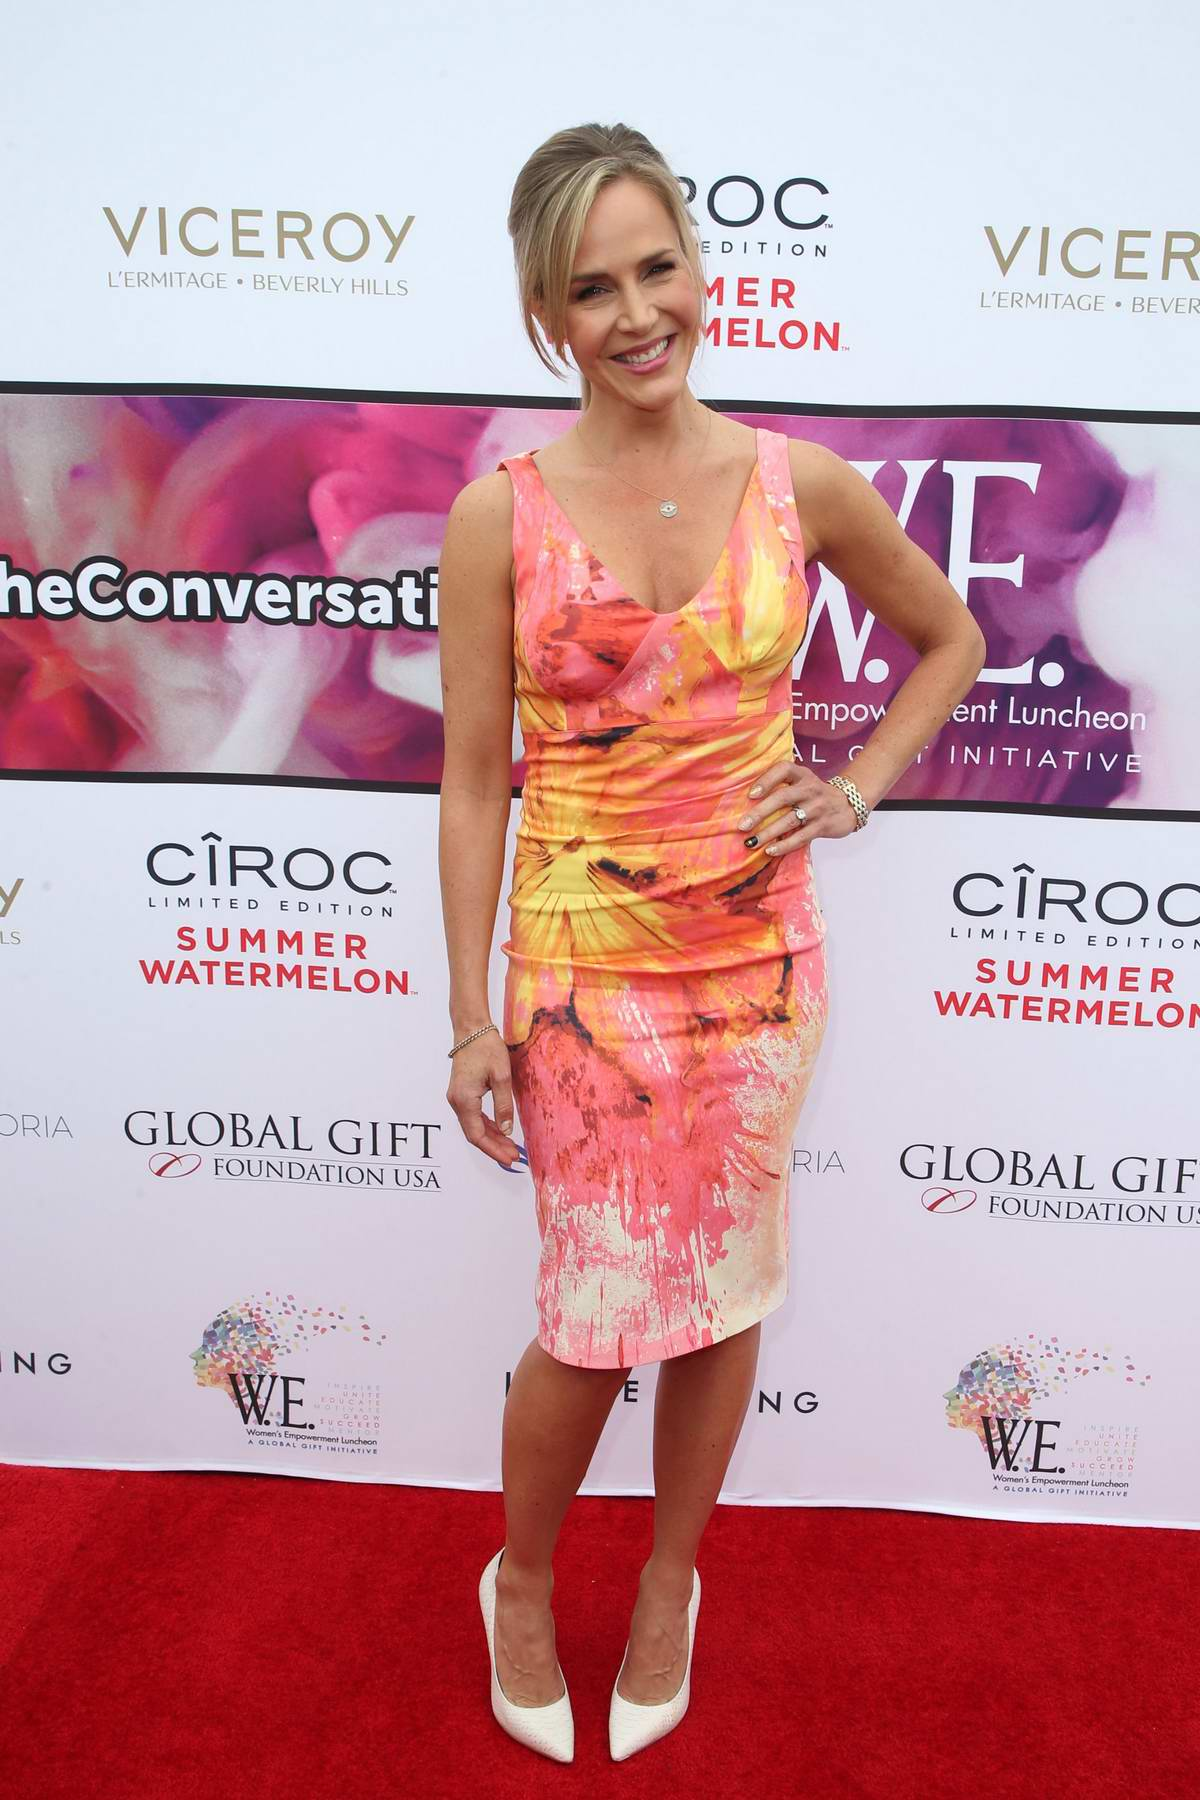 Julie Benz attends Eva Longoria's Global Gift Foundation Women Empowerment Luncheon in Beverly Hills, Los Angeles